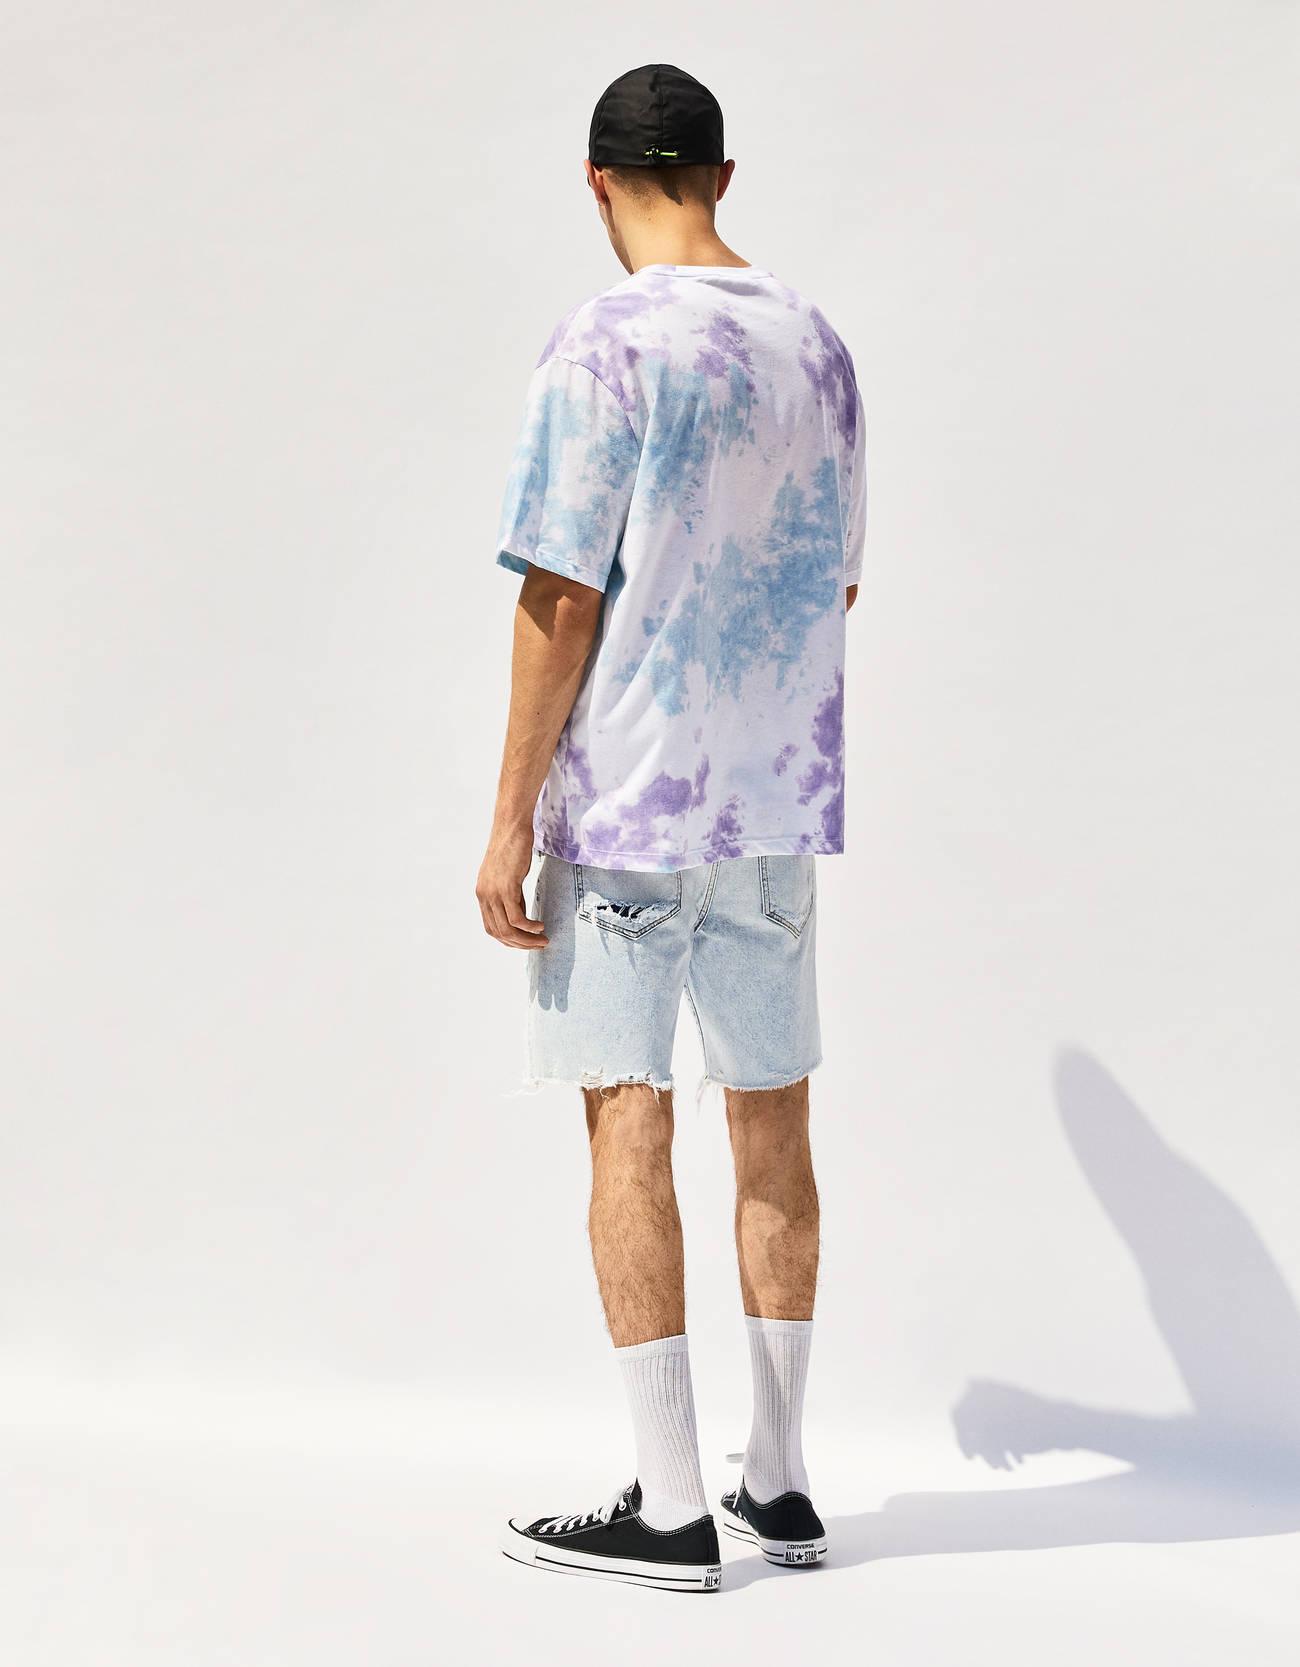 6eb9cfd34dbd Μπλούζα tie dye - Trends - Bershka Greece